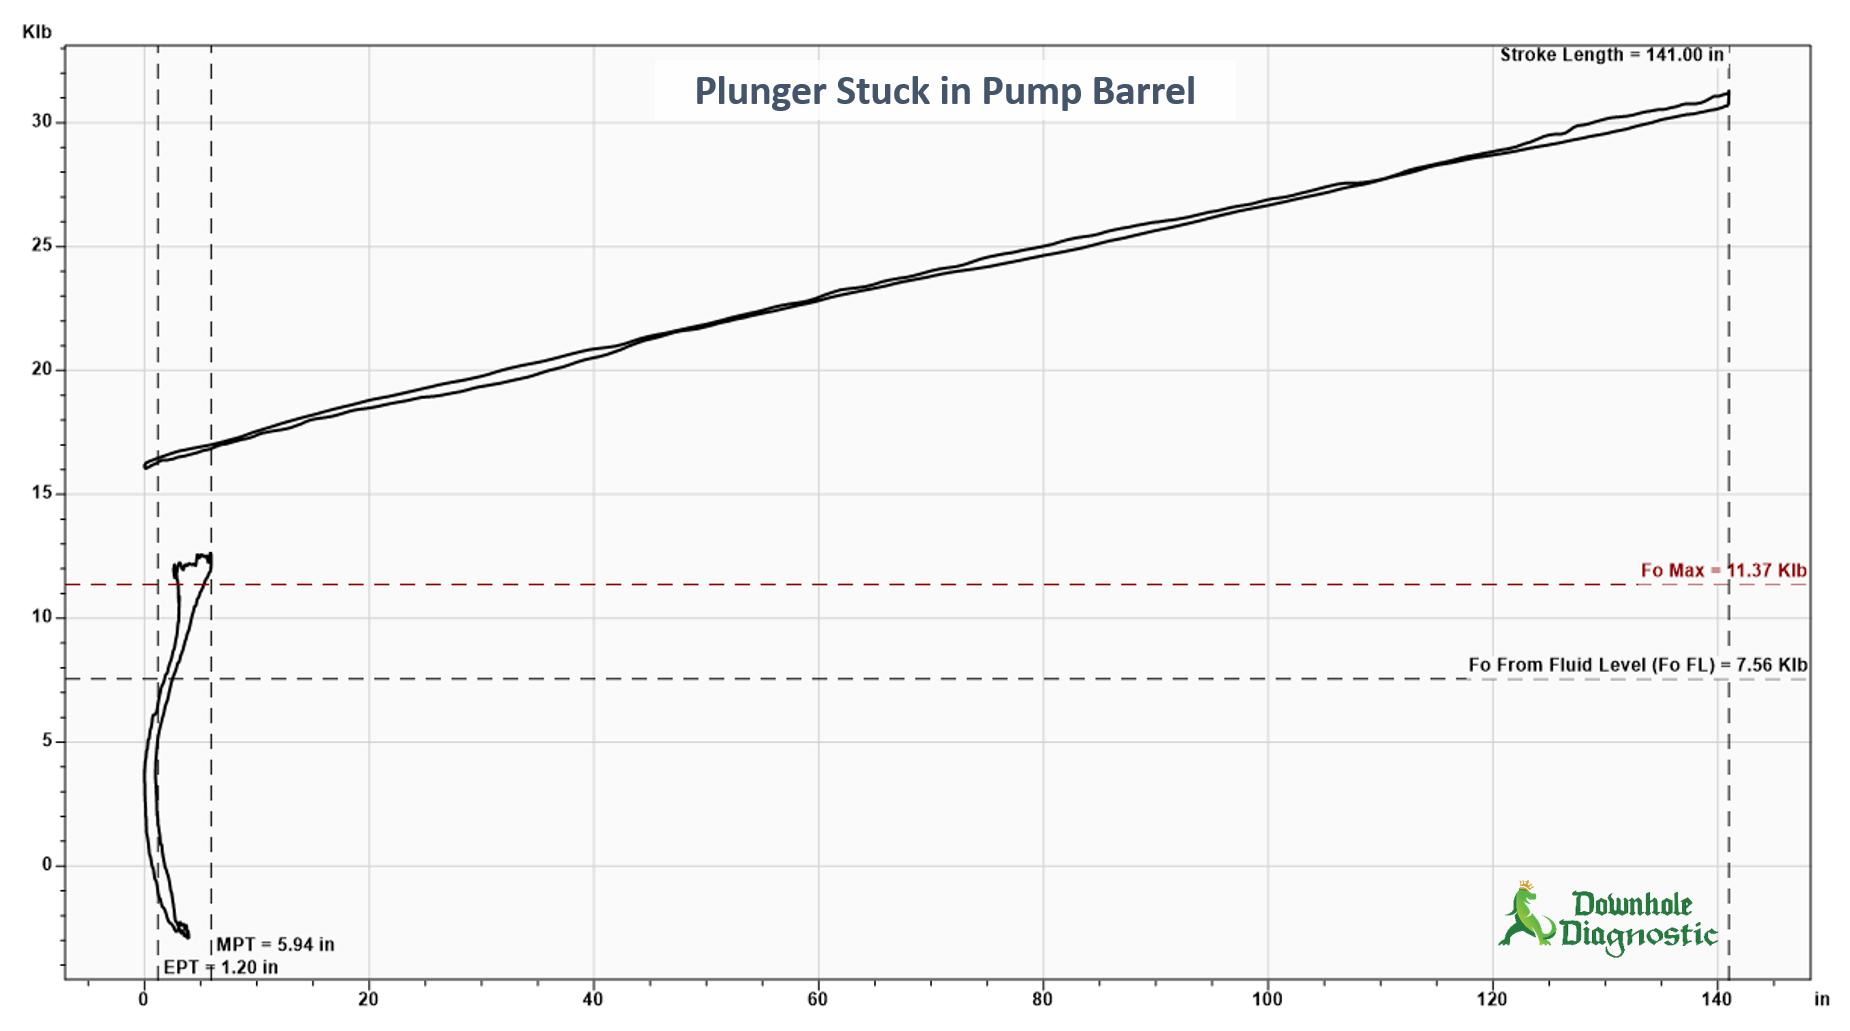 Plunger Stuck in Pump Barrel